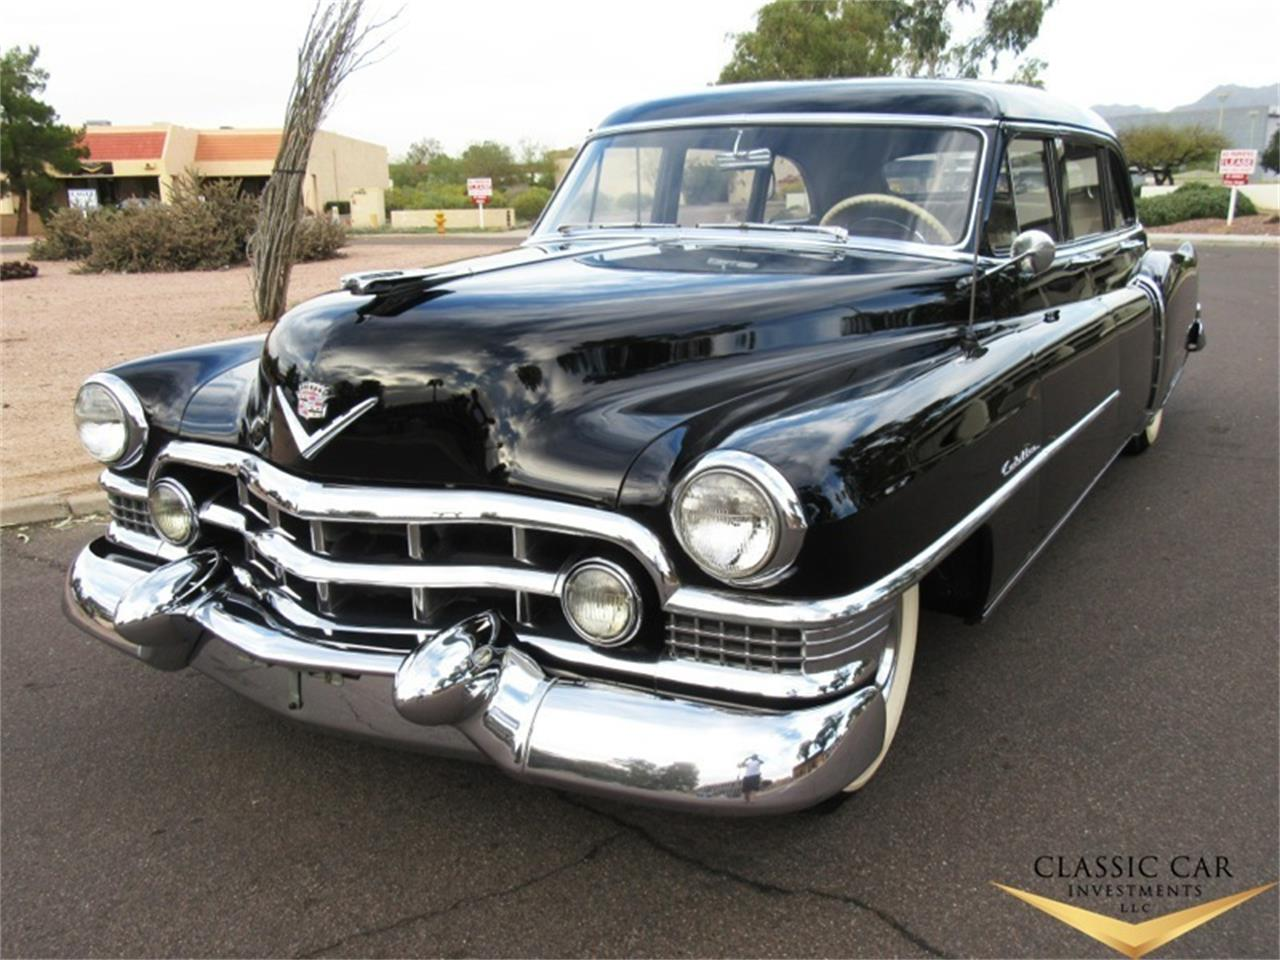 1951 Cadillac Fleetwood Limousine For Sale Cc 957996 Sedan Large Picture Of 51 Kj70